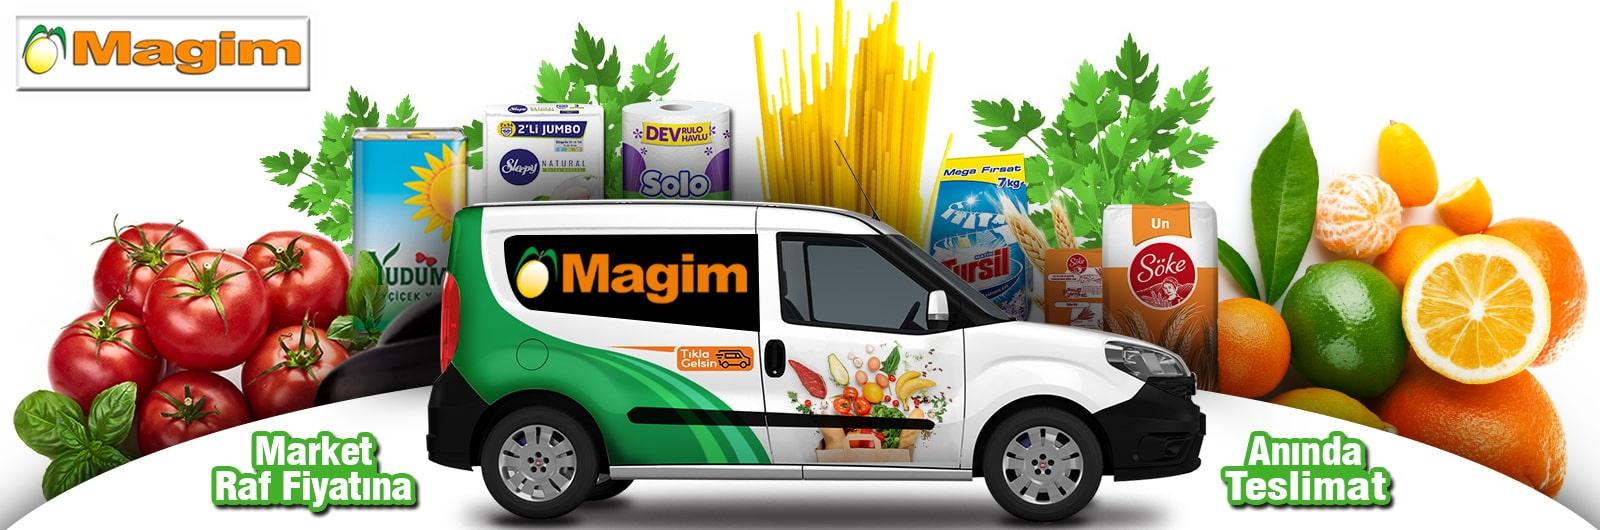 Malatya Magim Gross Sanal Market